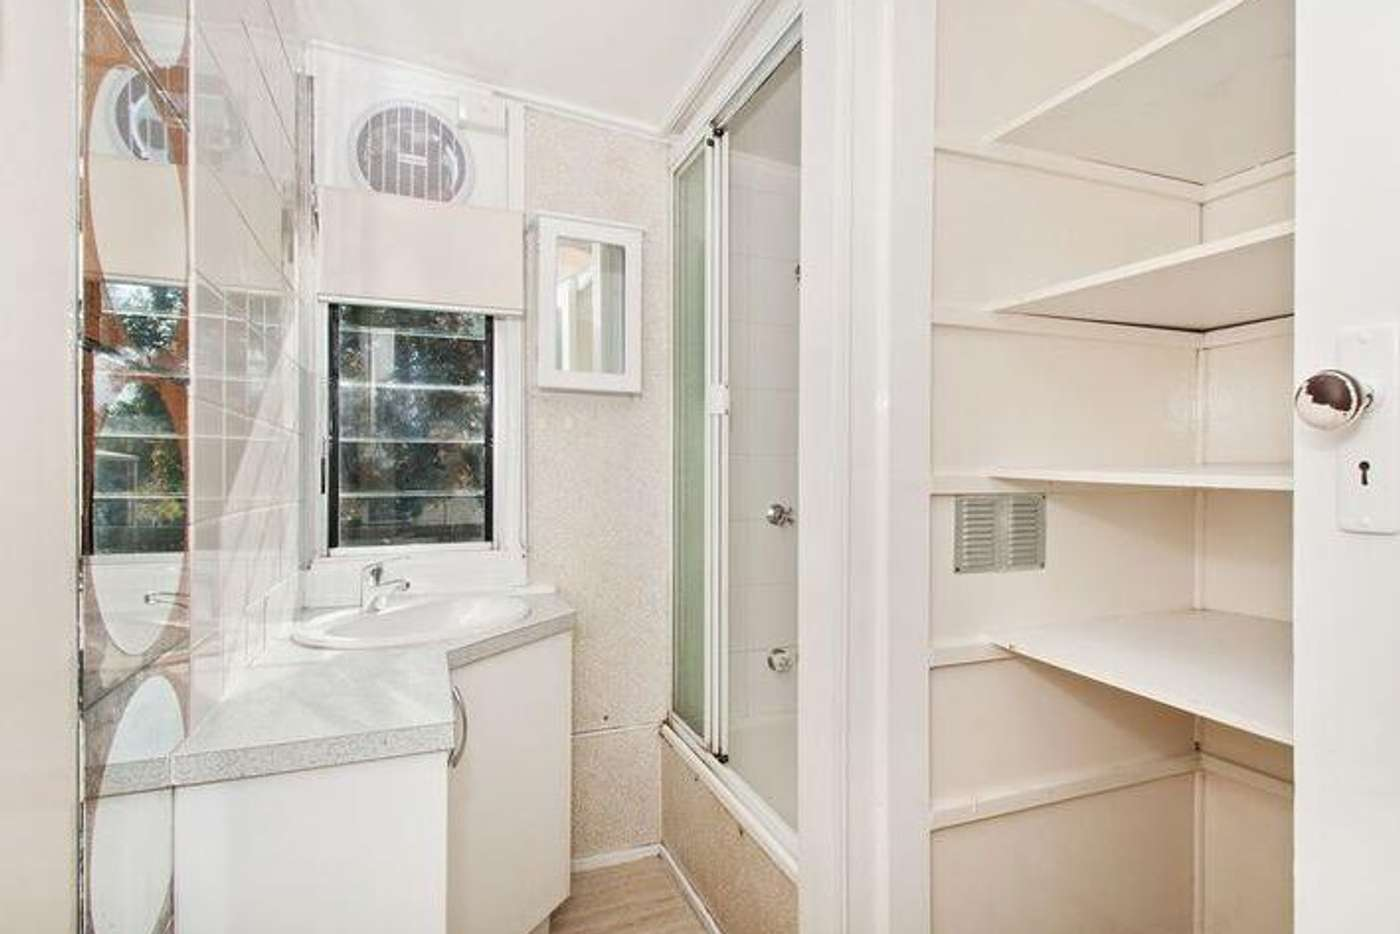 Seventh view of Homely house listing, 13 Oates Avenue, Woodridge QLD 4114